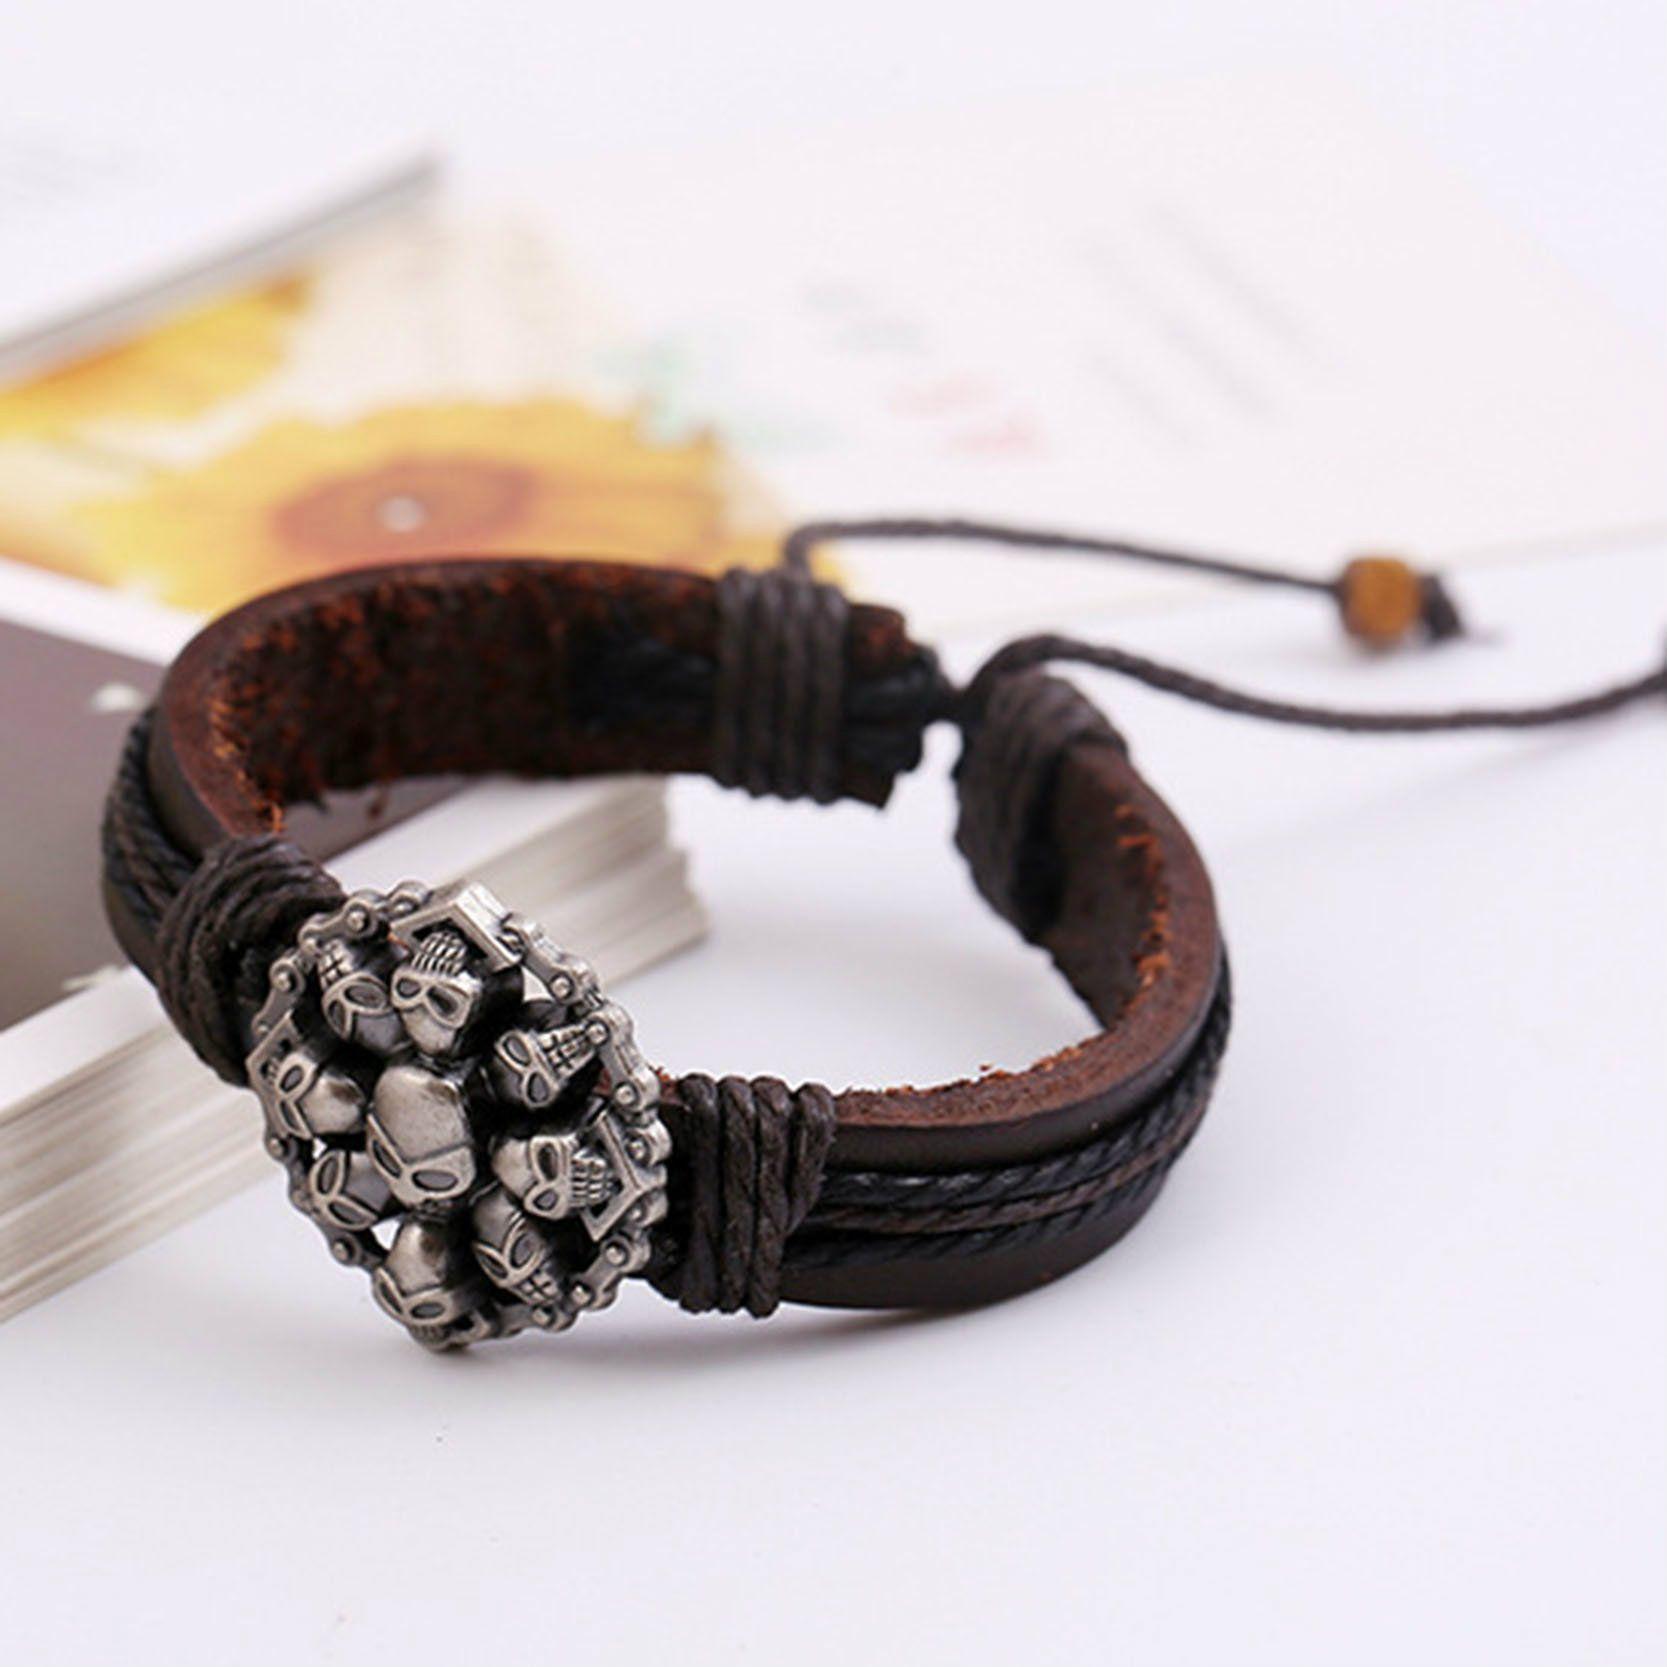 7b51b5cab240 Skull Retro Leather Dark Brown Bracelets   Price   9.95   FREE Shipping